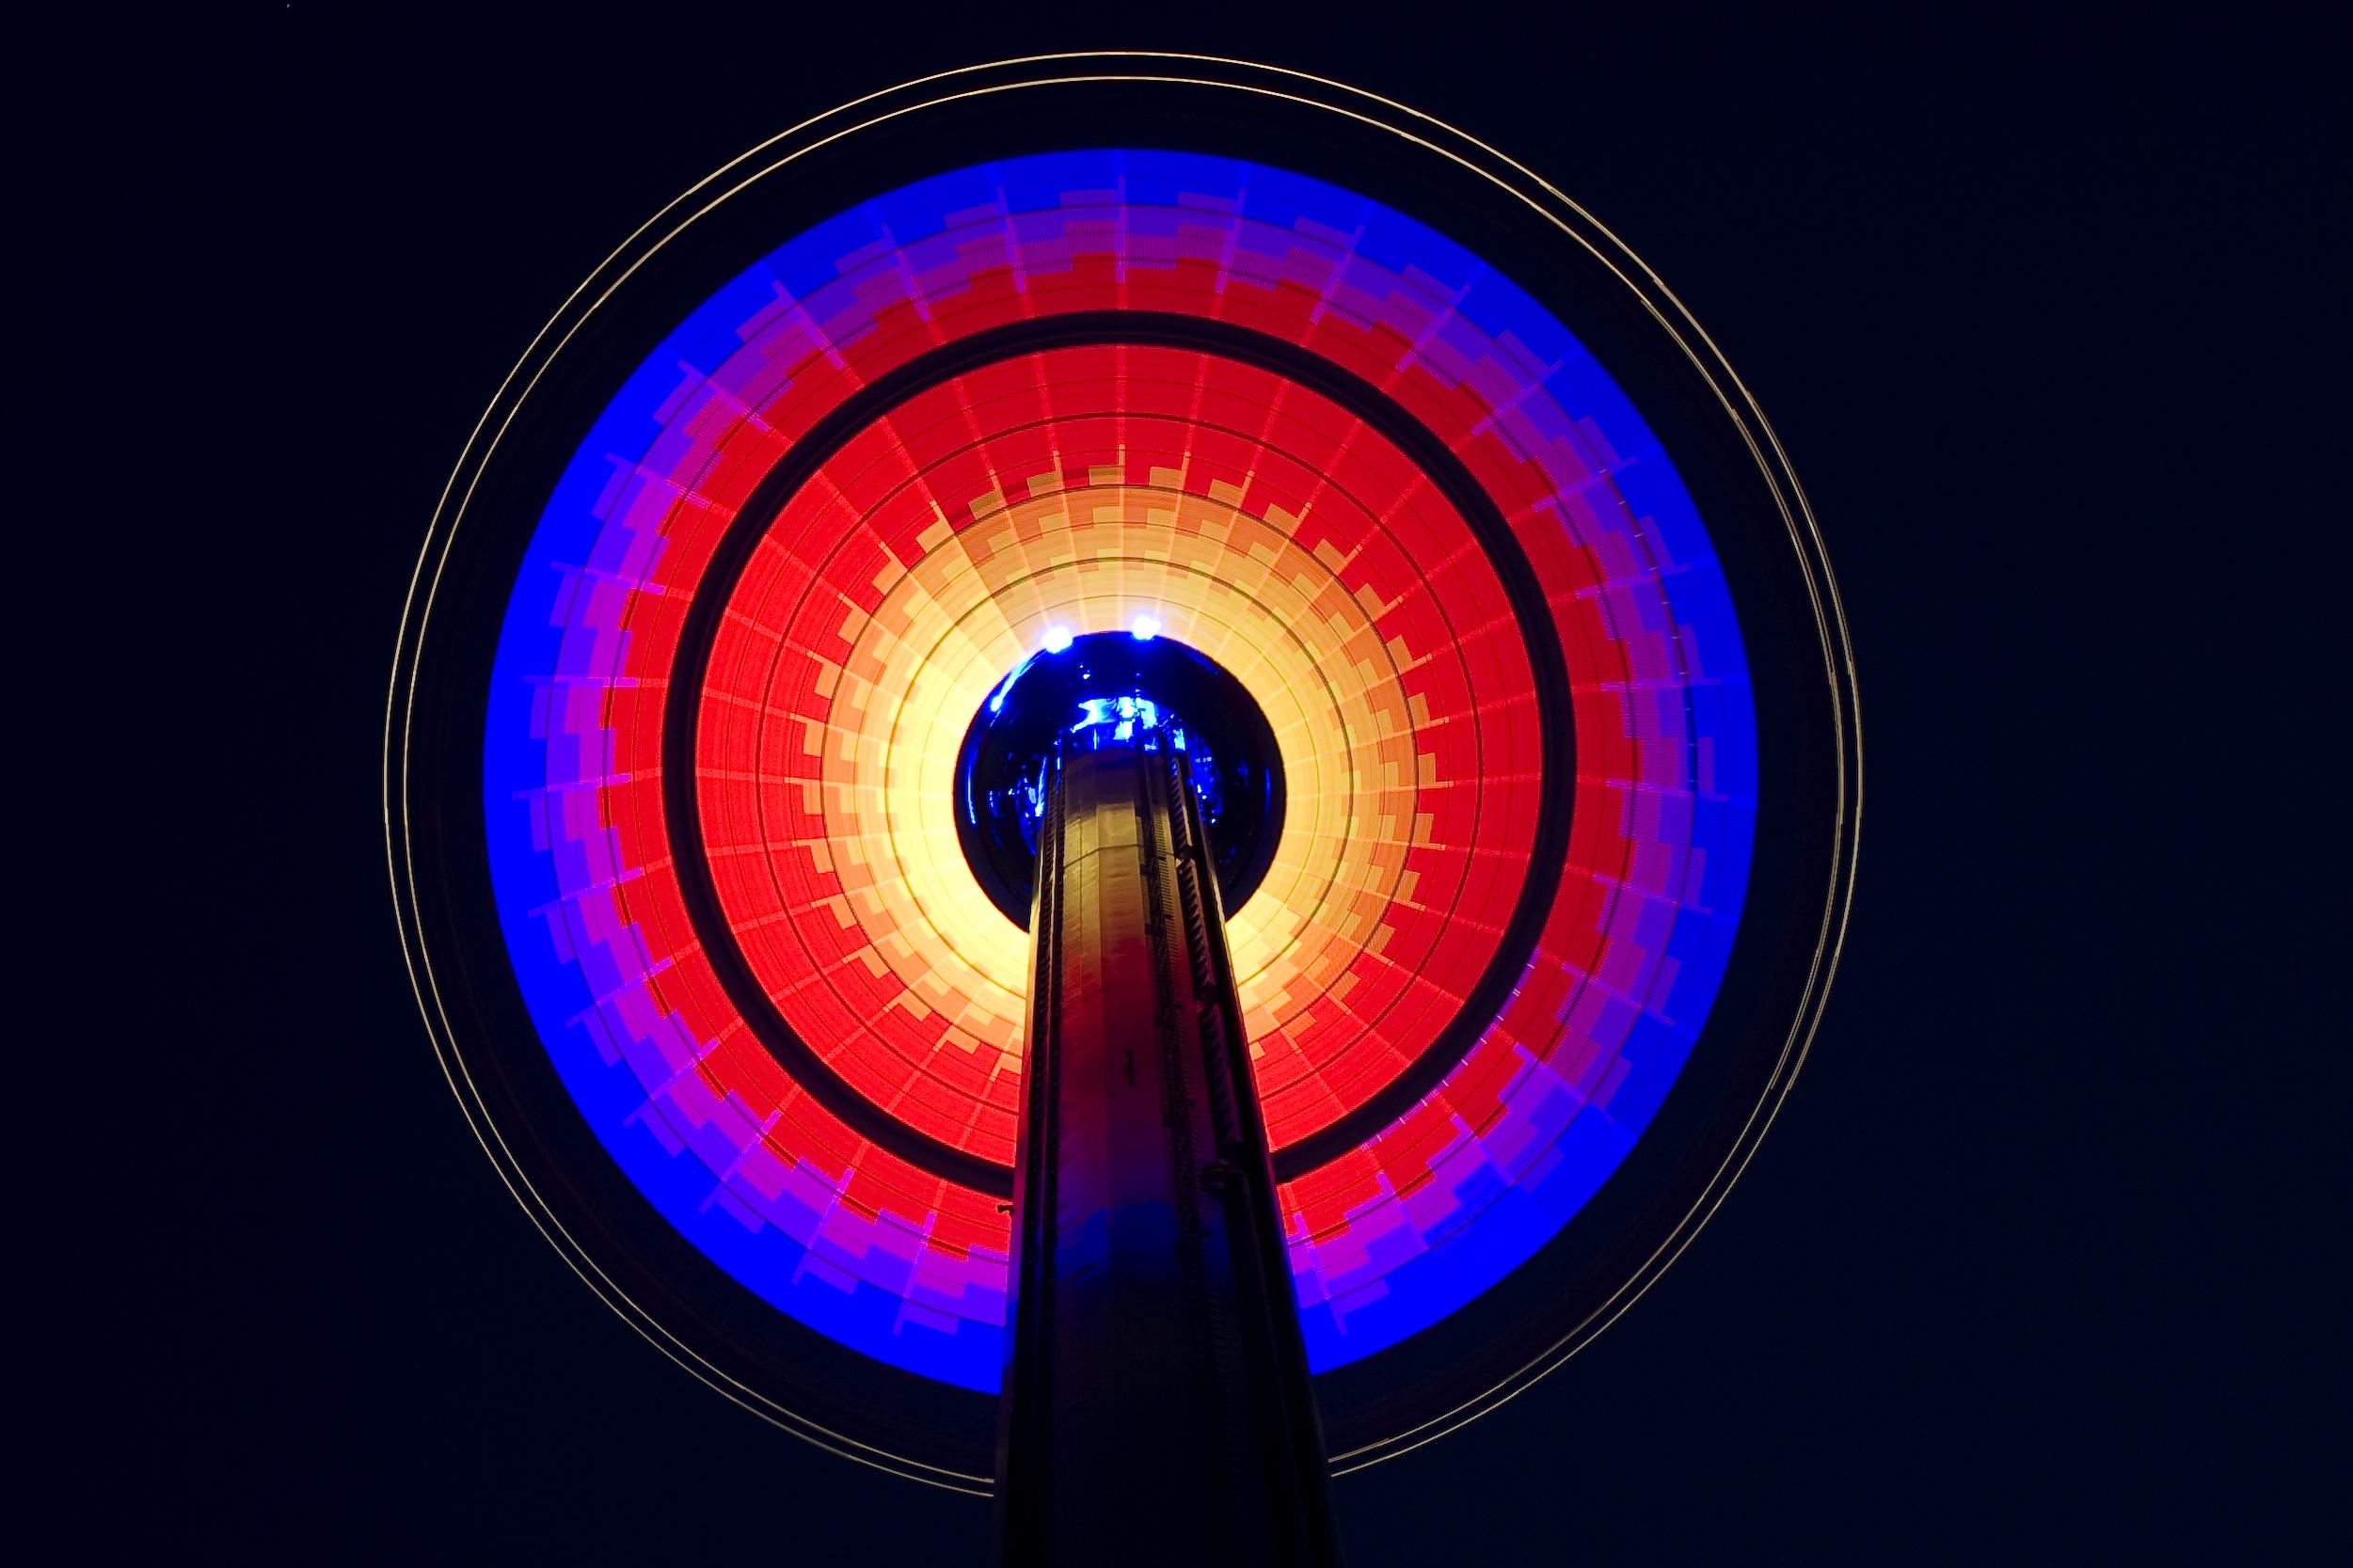 Night light wikipedia - File Windseeker At Night Light Design 4 Jpg